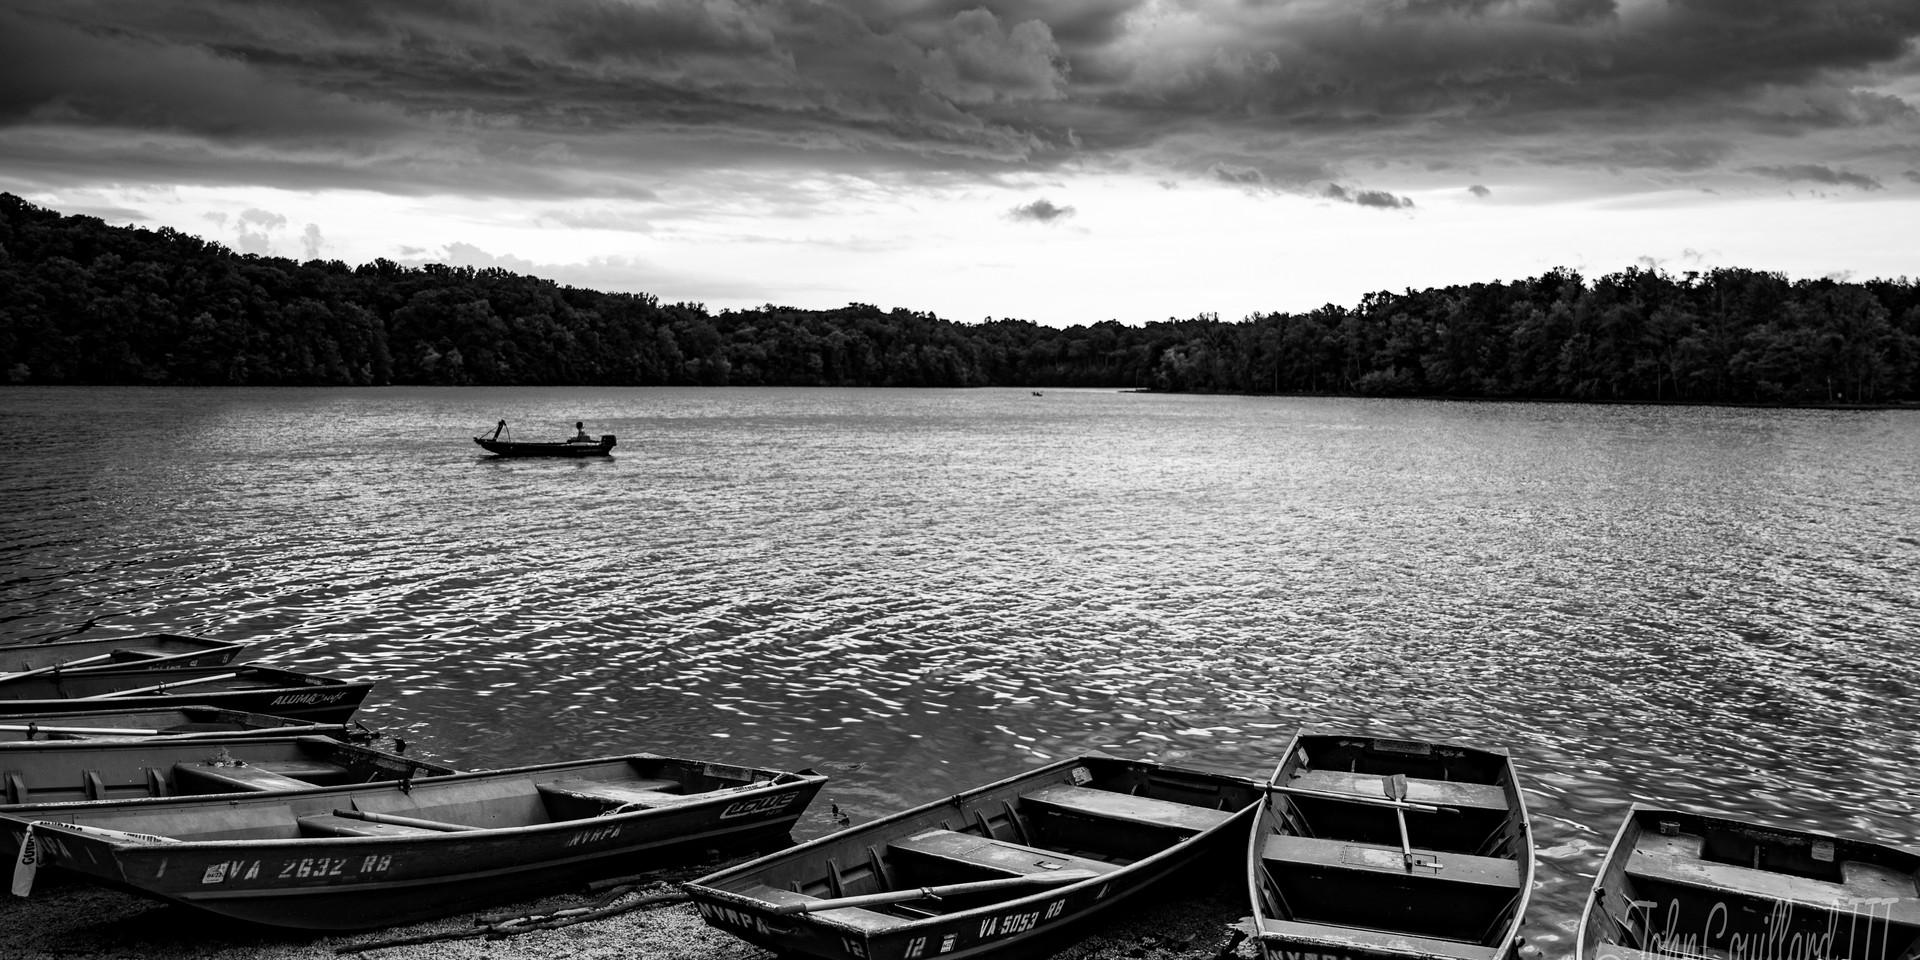 The Lonley Boatman